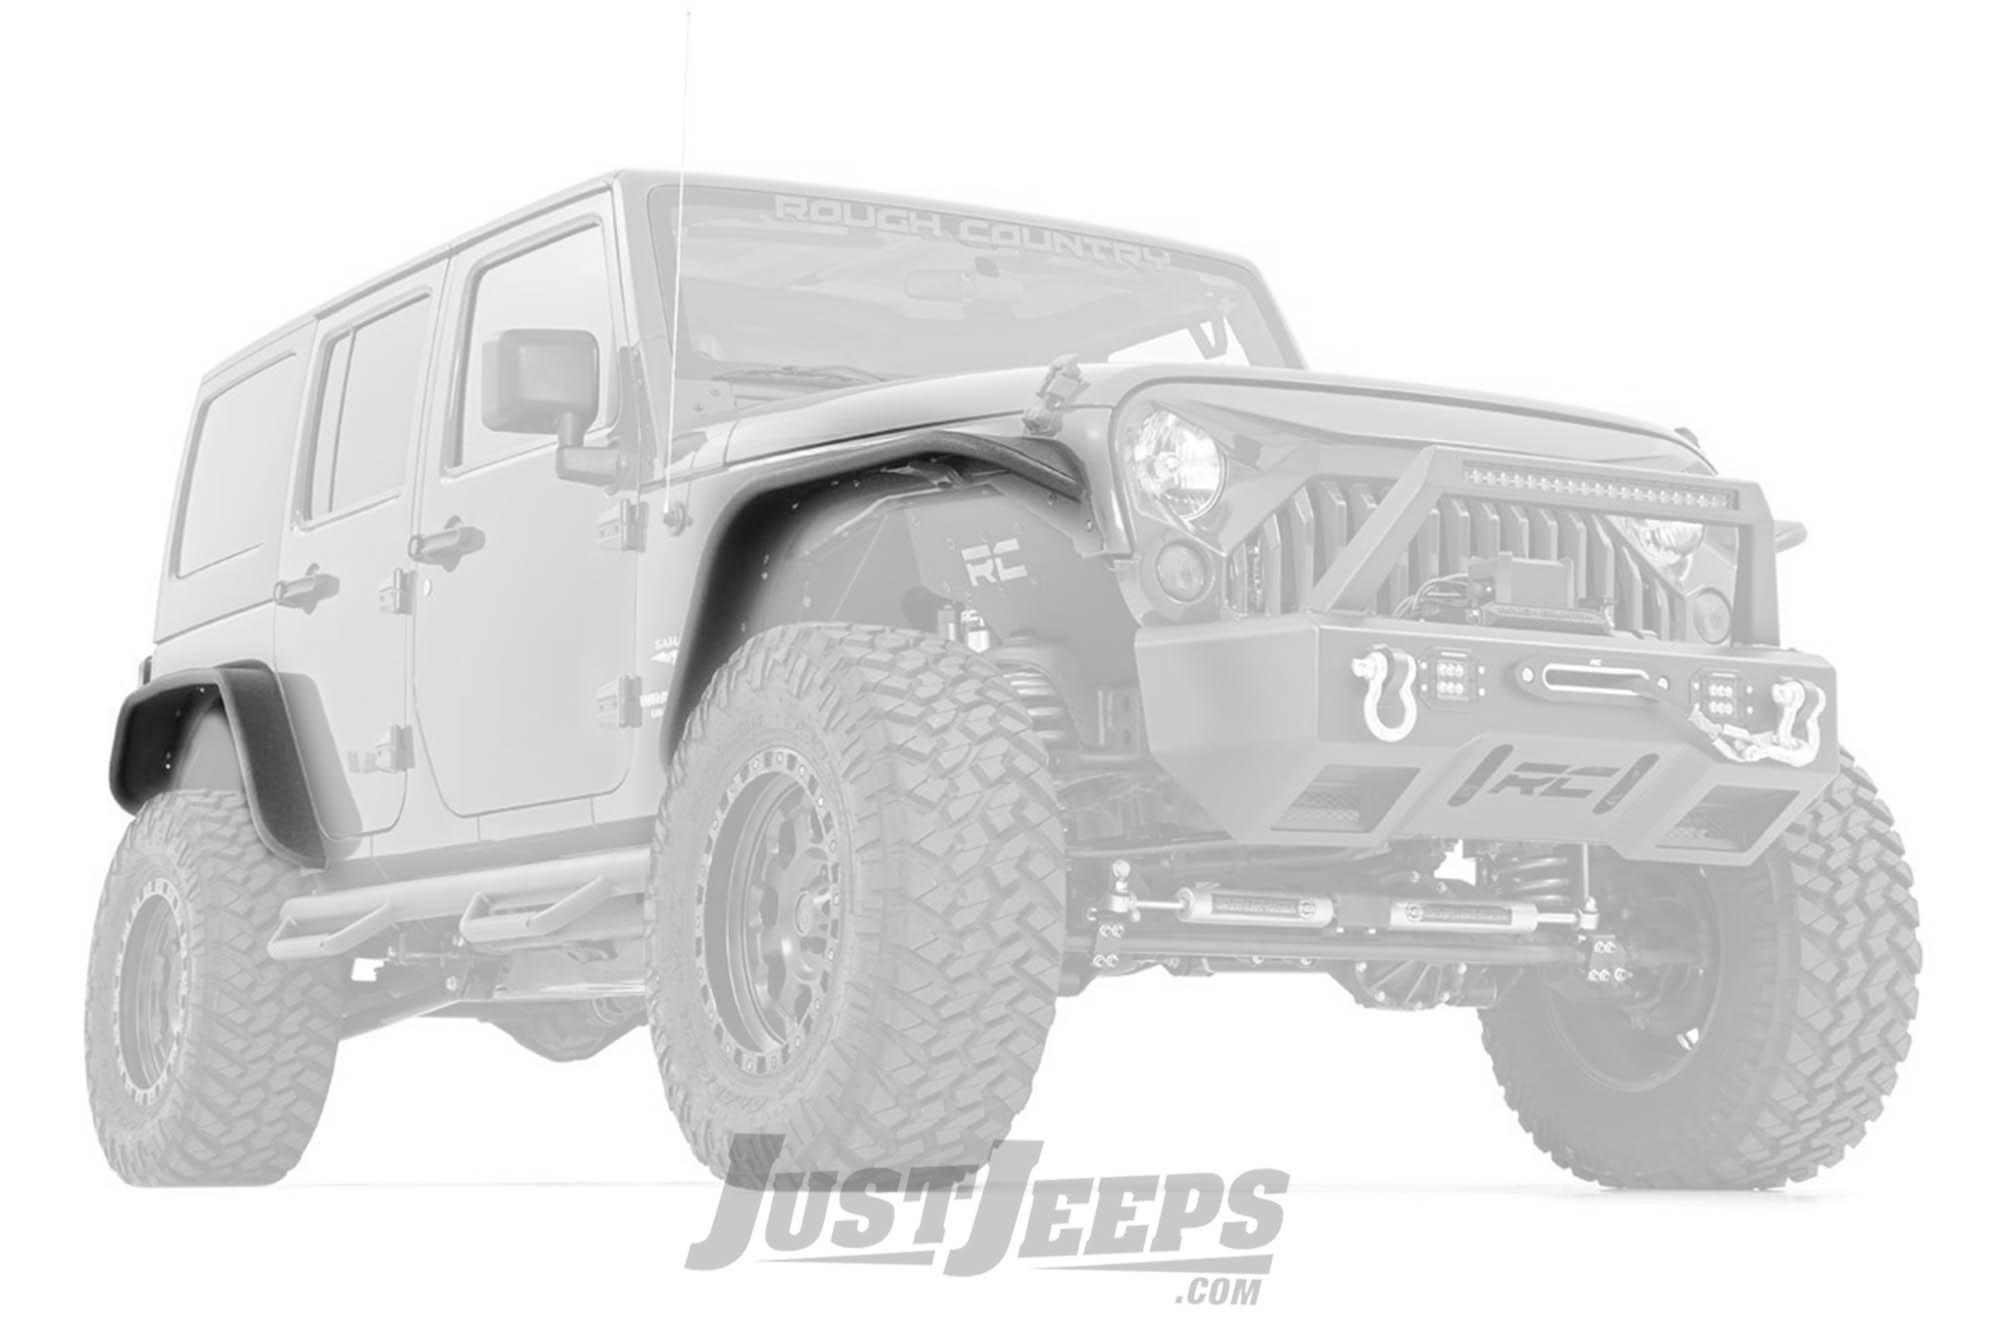 Rough Country Tubular Front & Rear Fender Flares Set For 2007-18 Jeep Wrangler JK 2 Door & Unlimited 4 Door Models